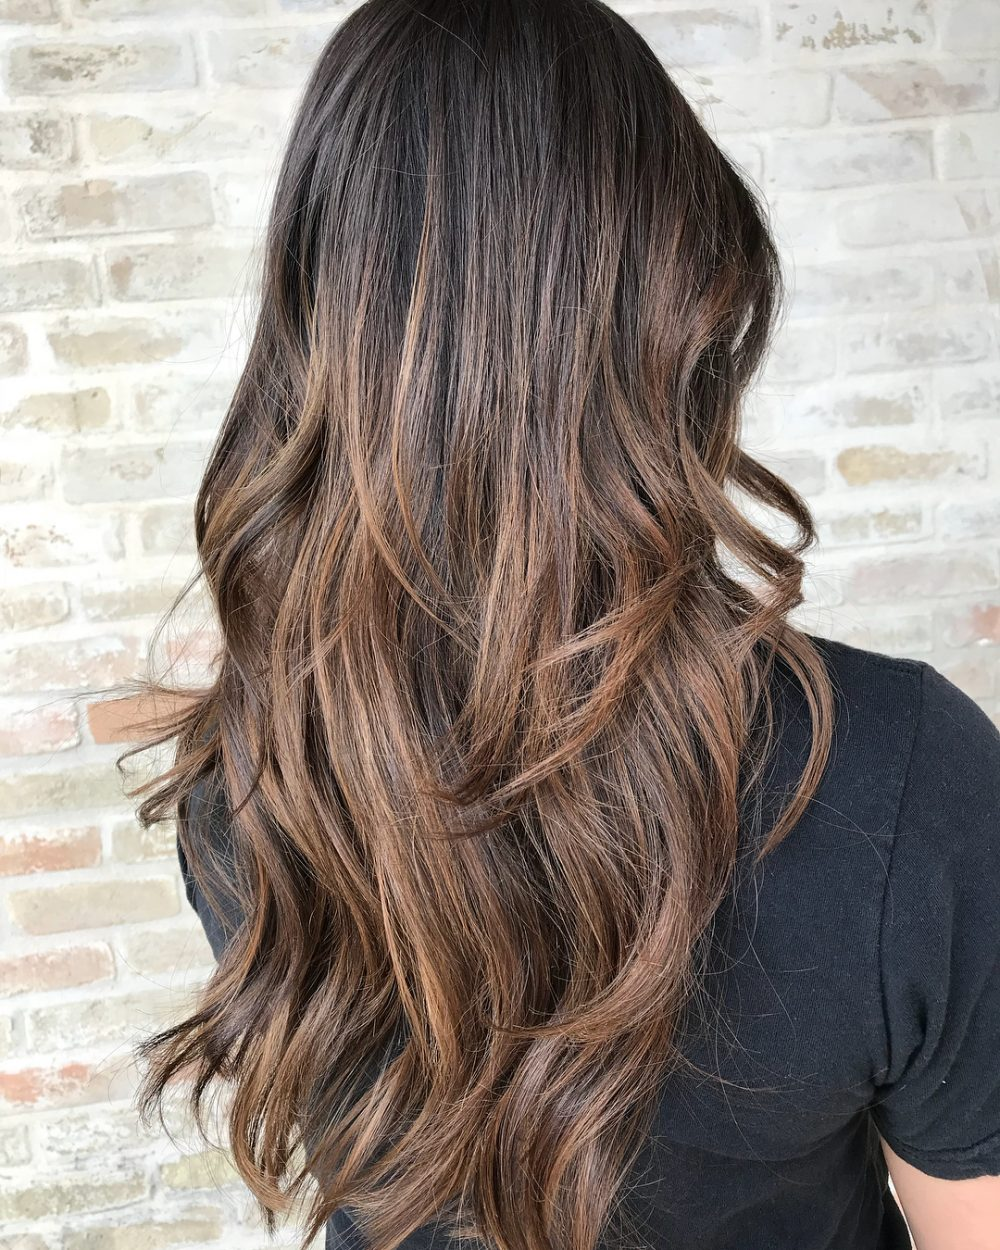 Warm Balayage Waves hairstyle